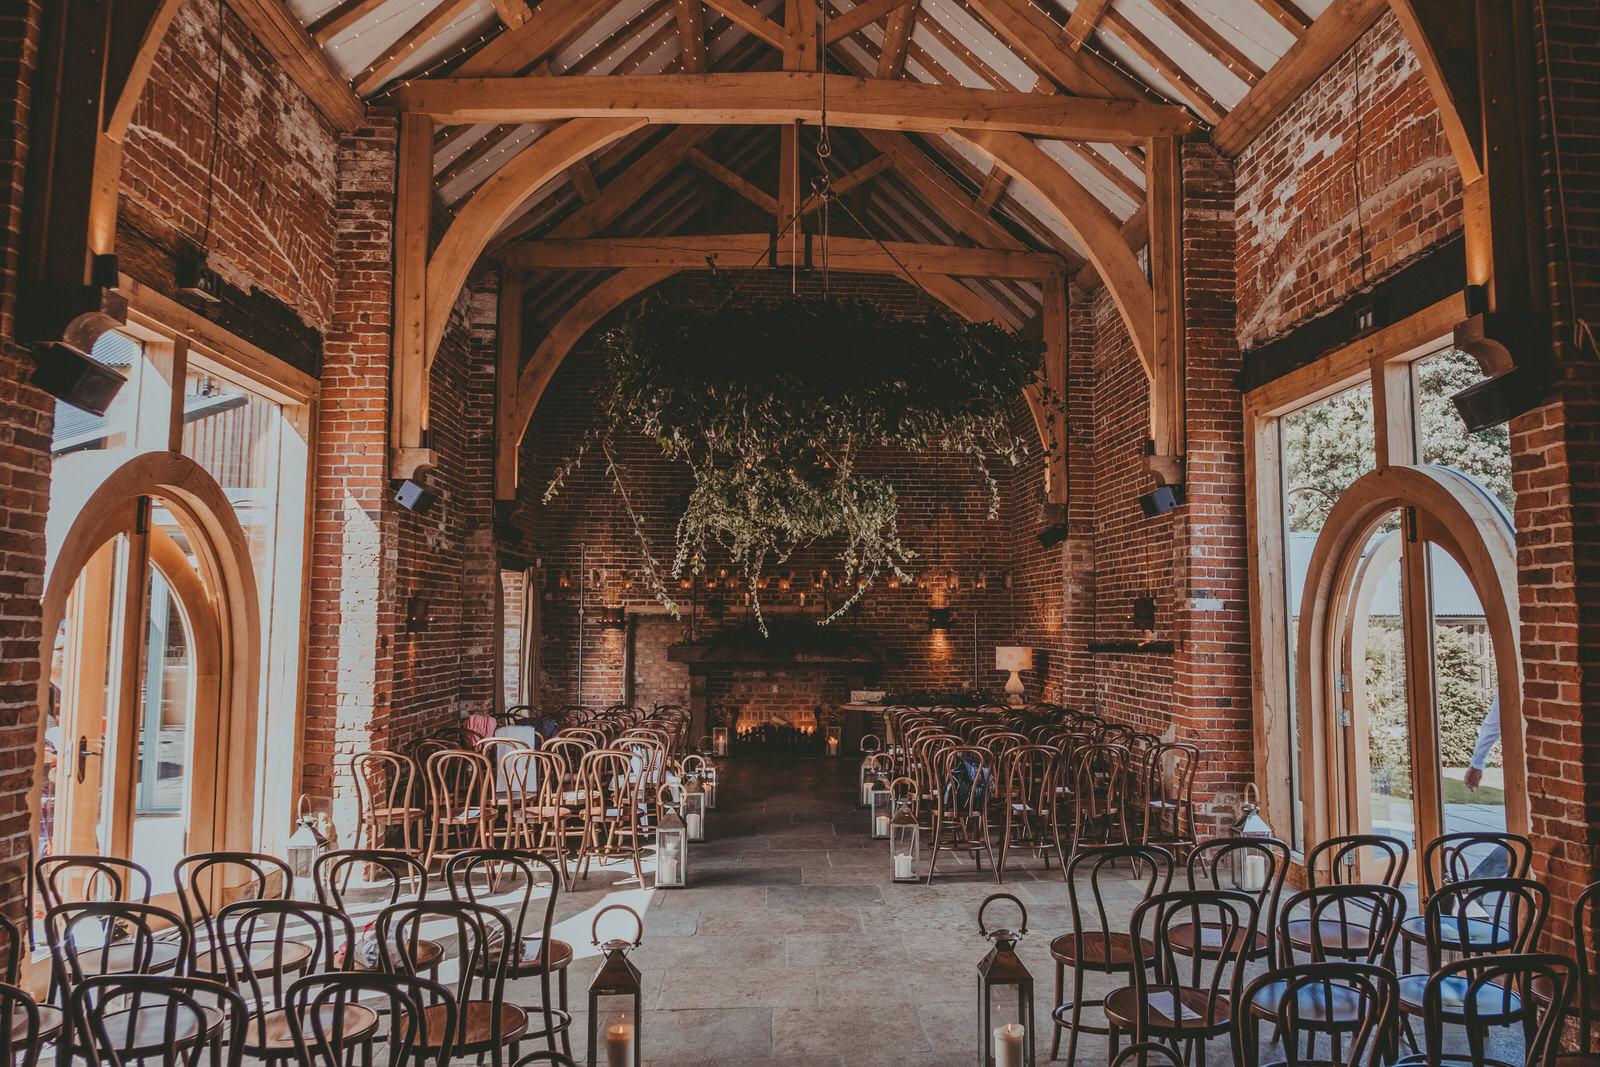 Hazel Gap Barn -Chris Snowden Photography - Summer 2018 - Alex & Harrison (129)hazel+gap+nottinghamshire+wedding+venue_1.jpg